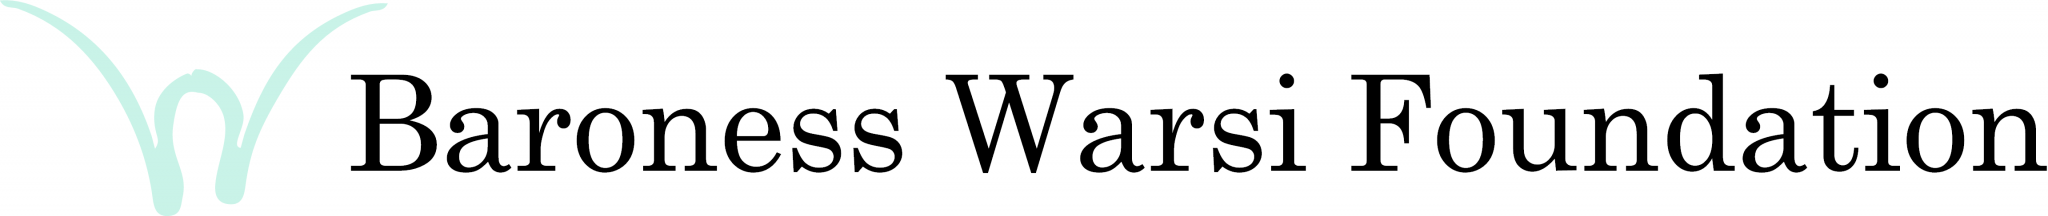 Baroness Warsi Foundation Logo